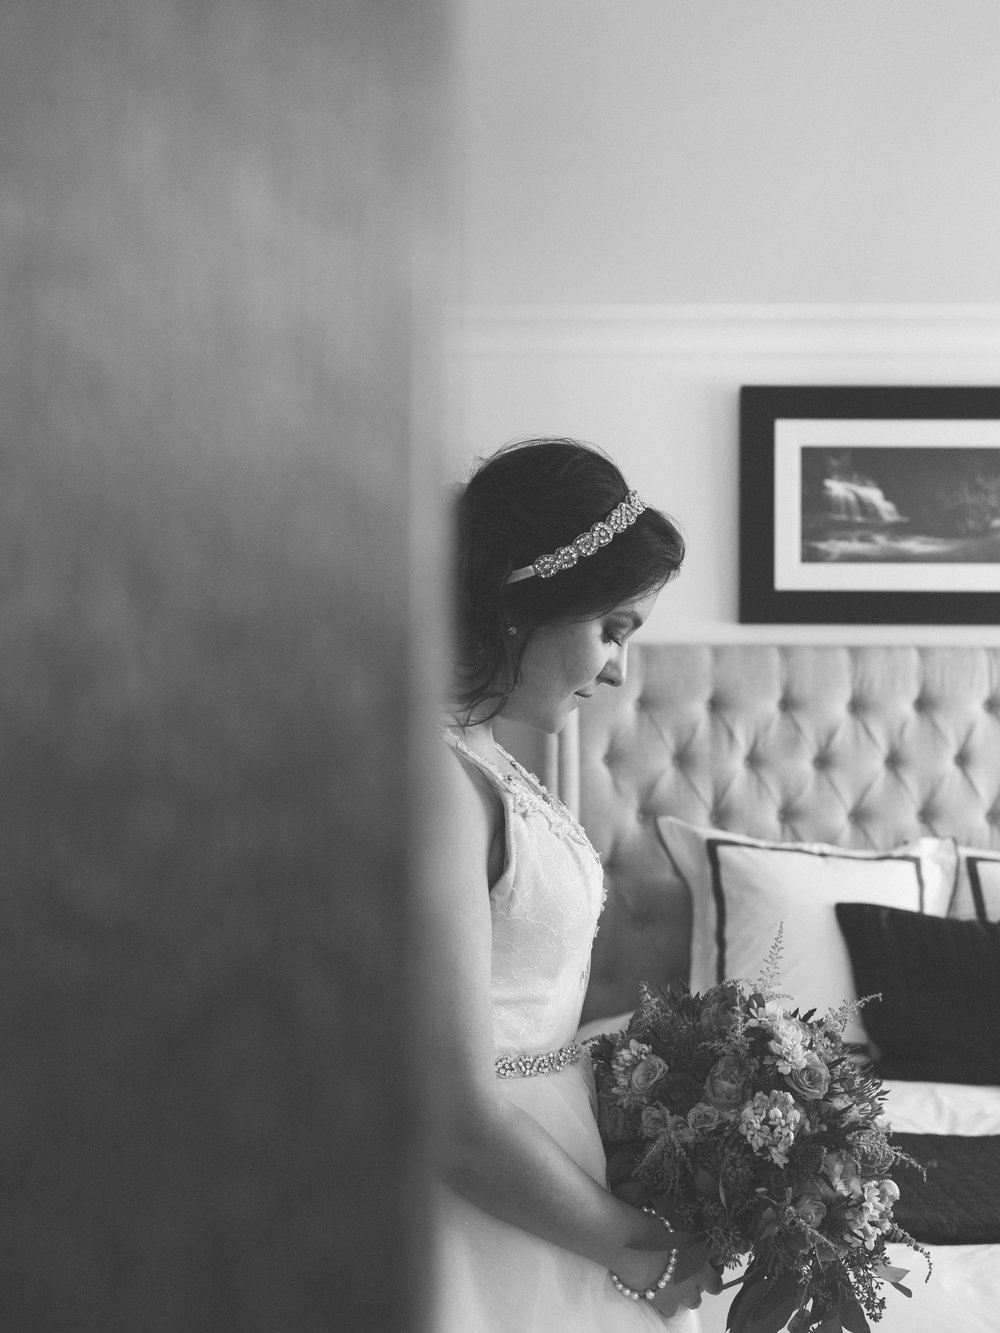 Banff Wedding Photographer - Destination Wedding Photographer - 6